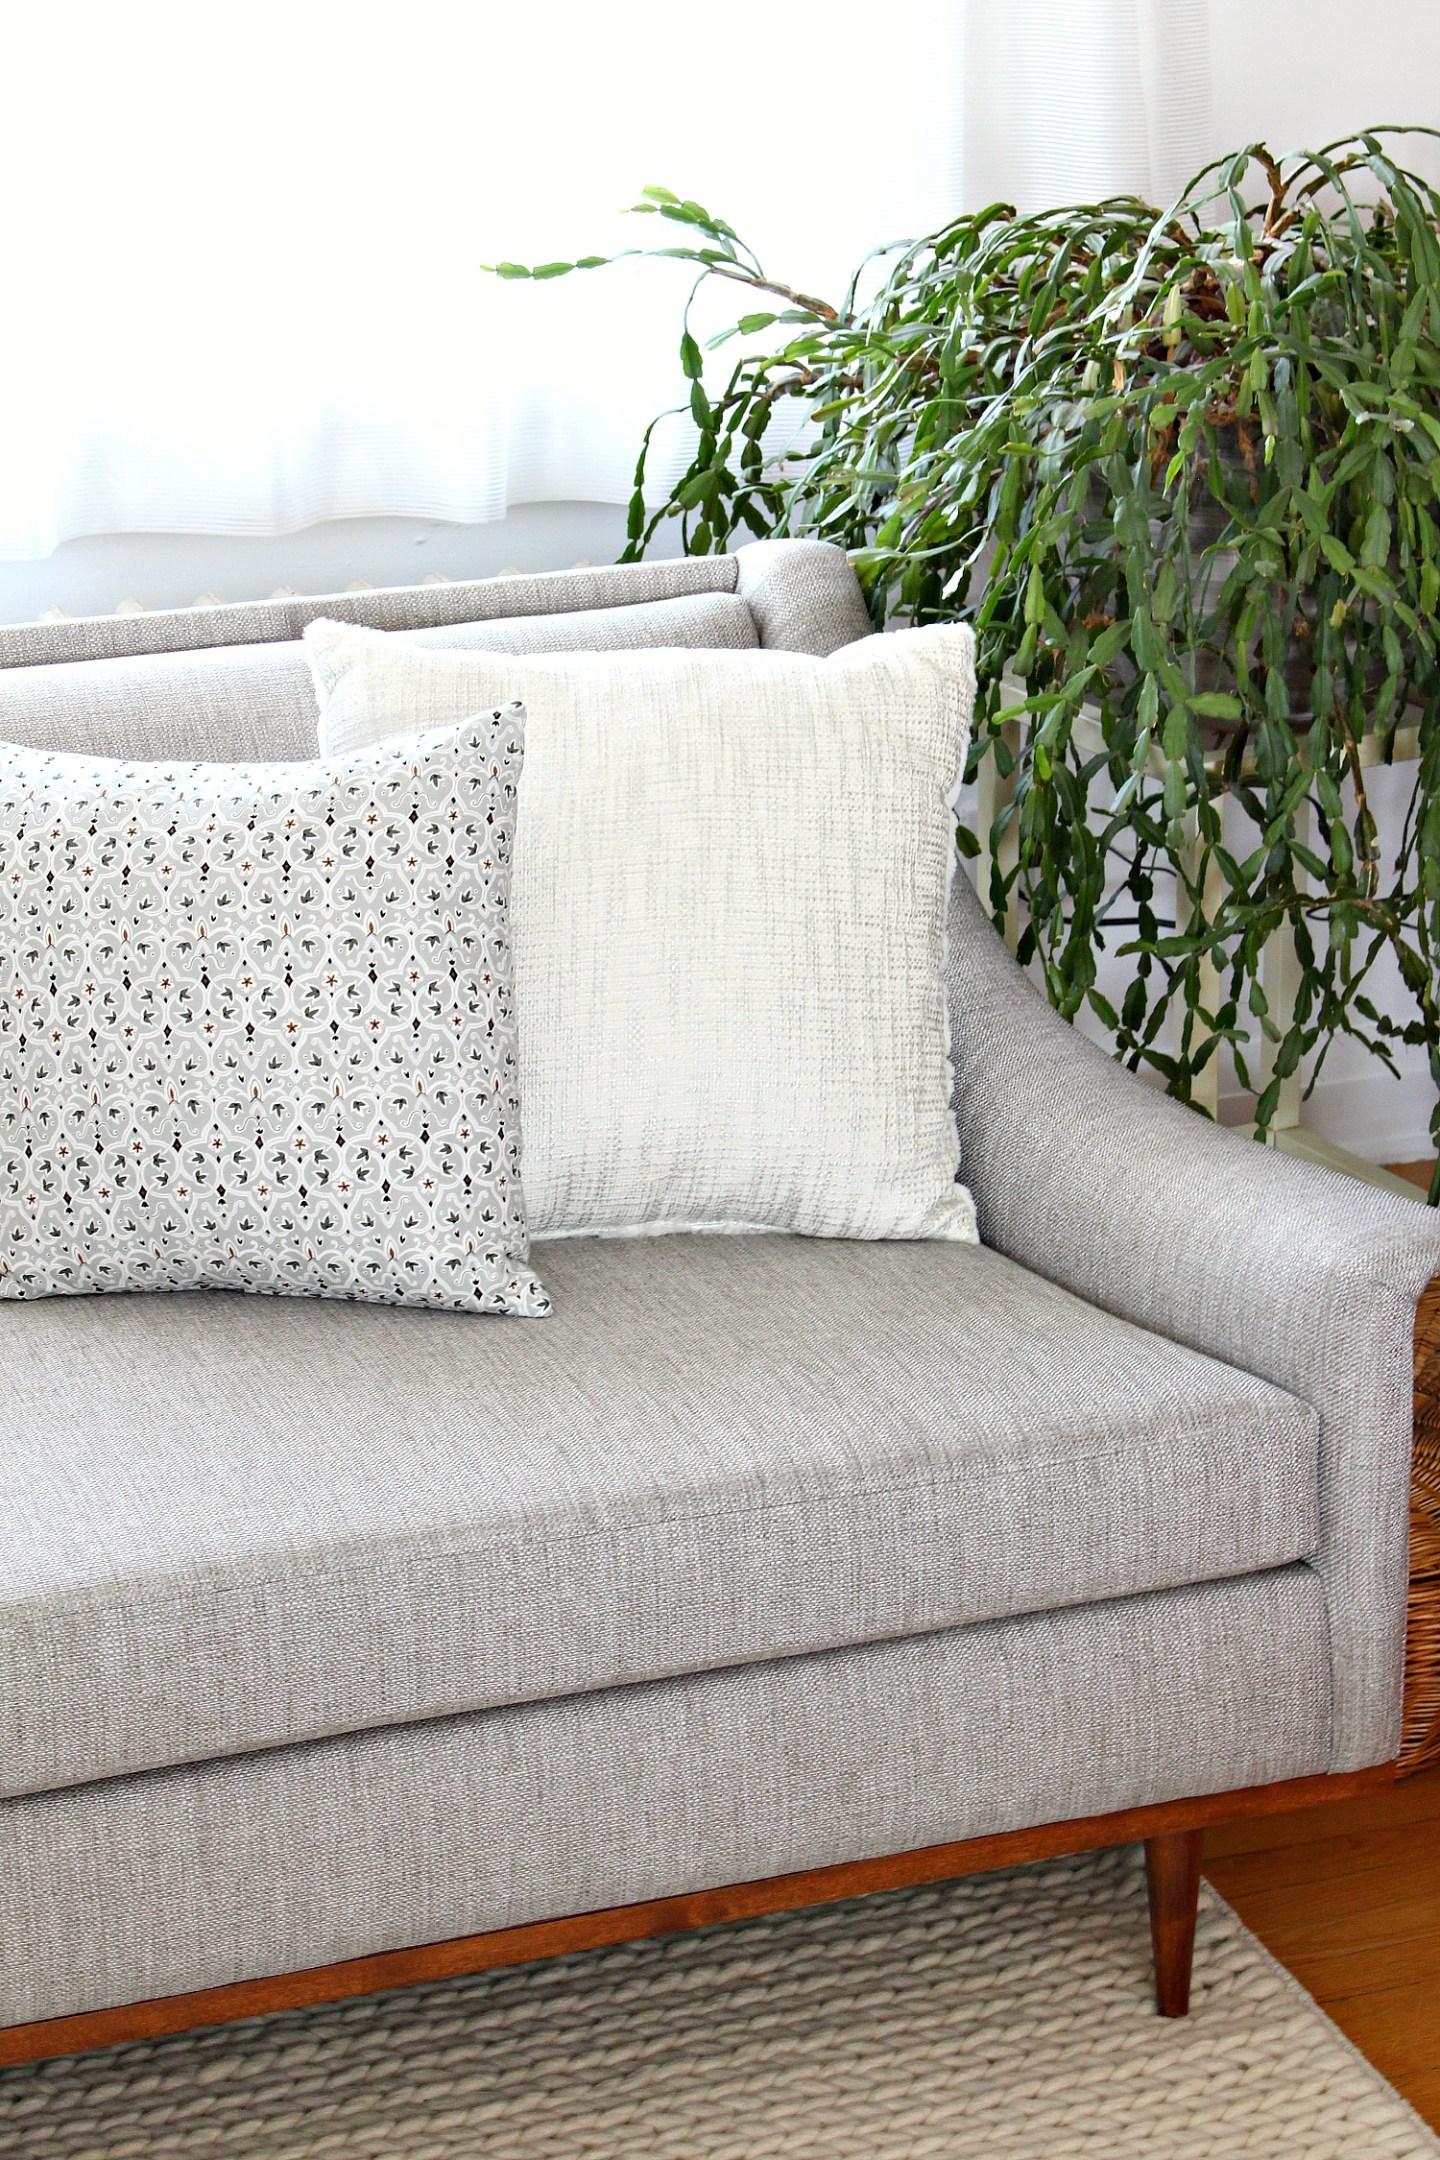 Vintage Sofa Makeover Project